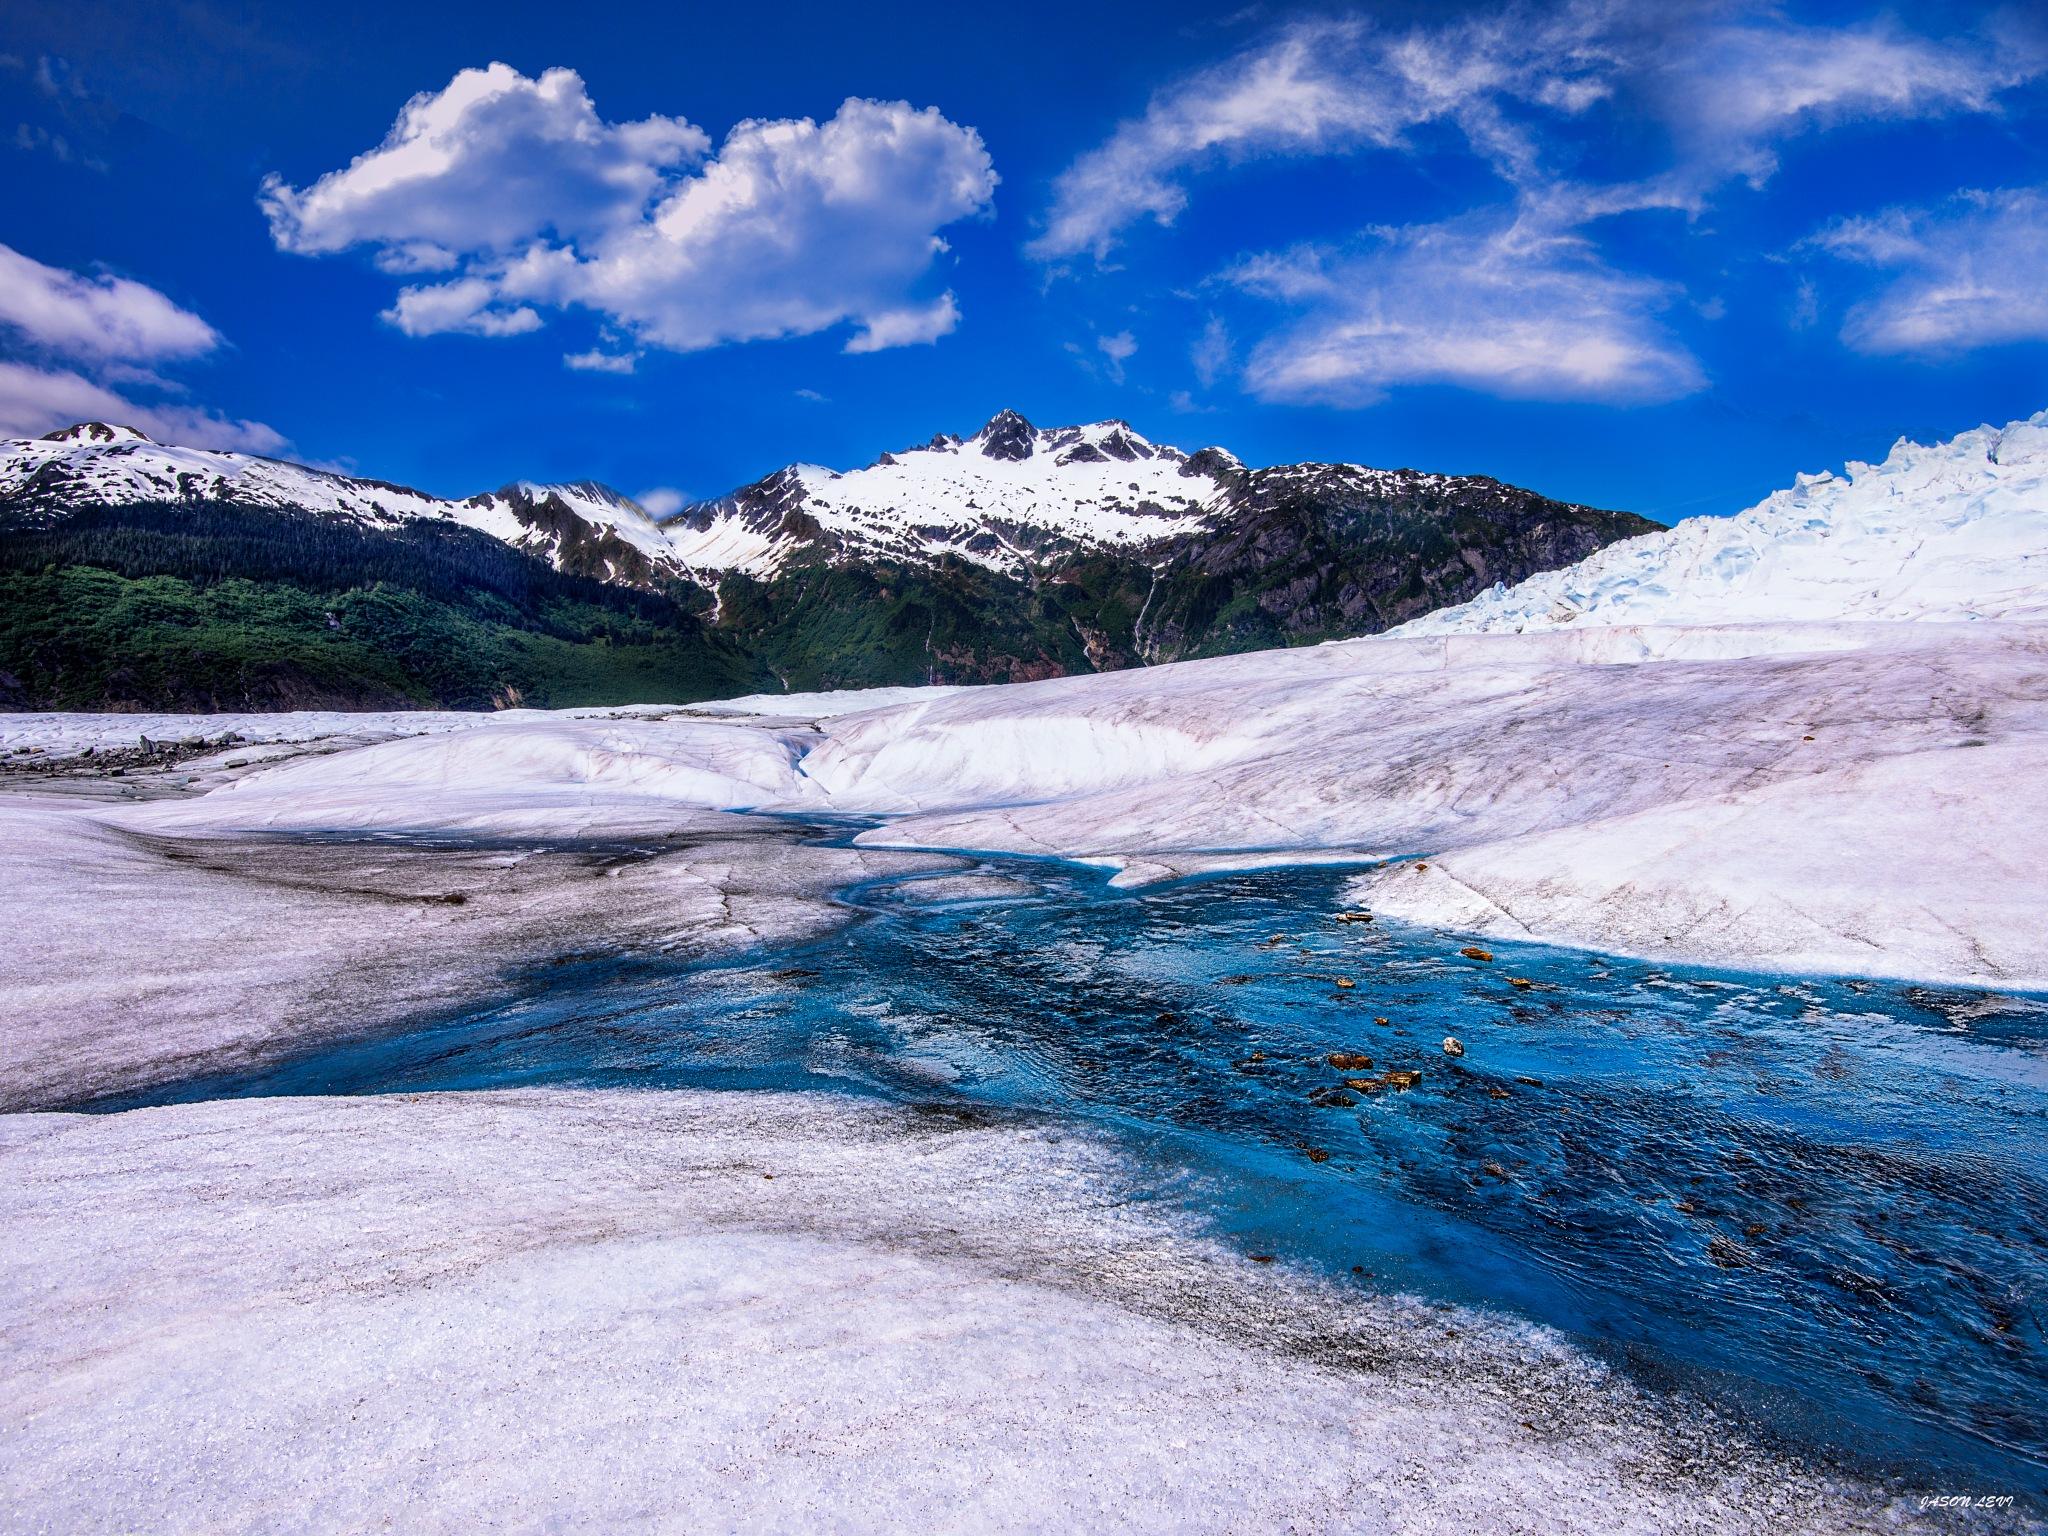 Alaska's Mendenhall Glacier by Jason Levi